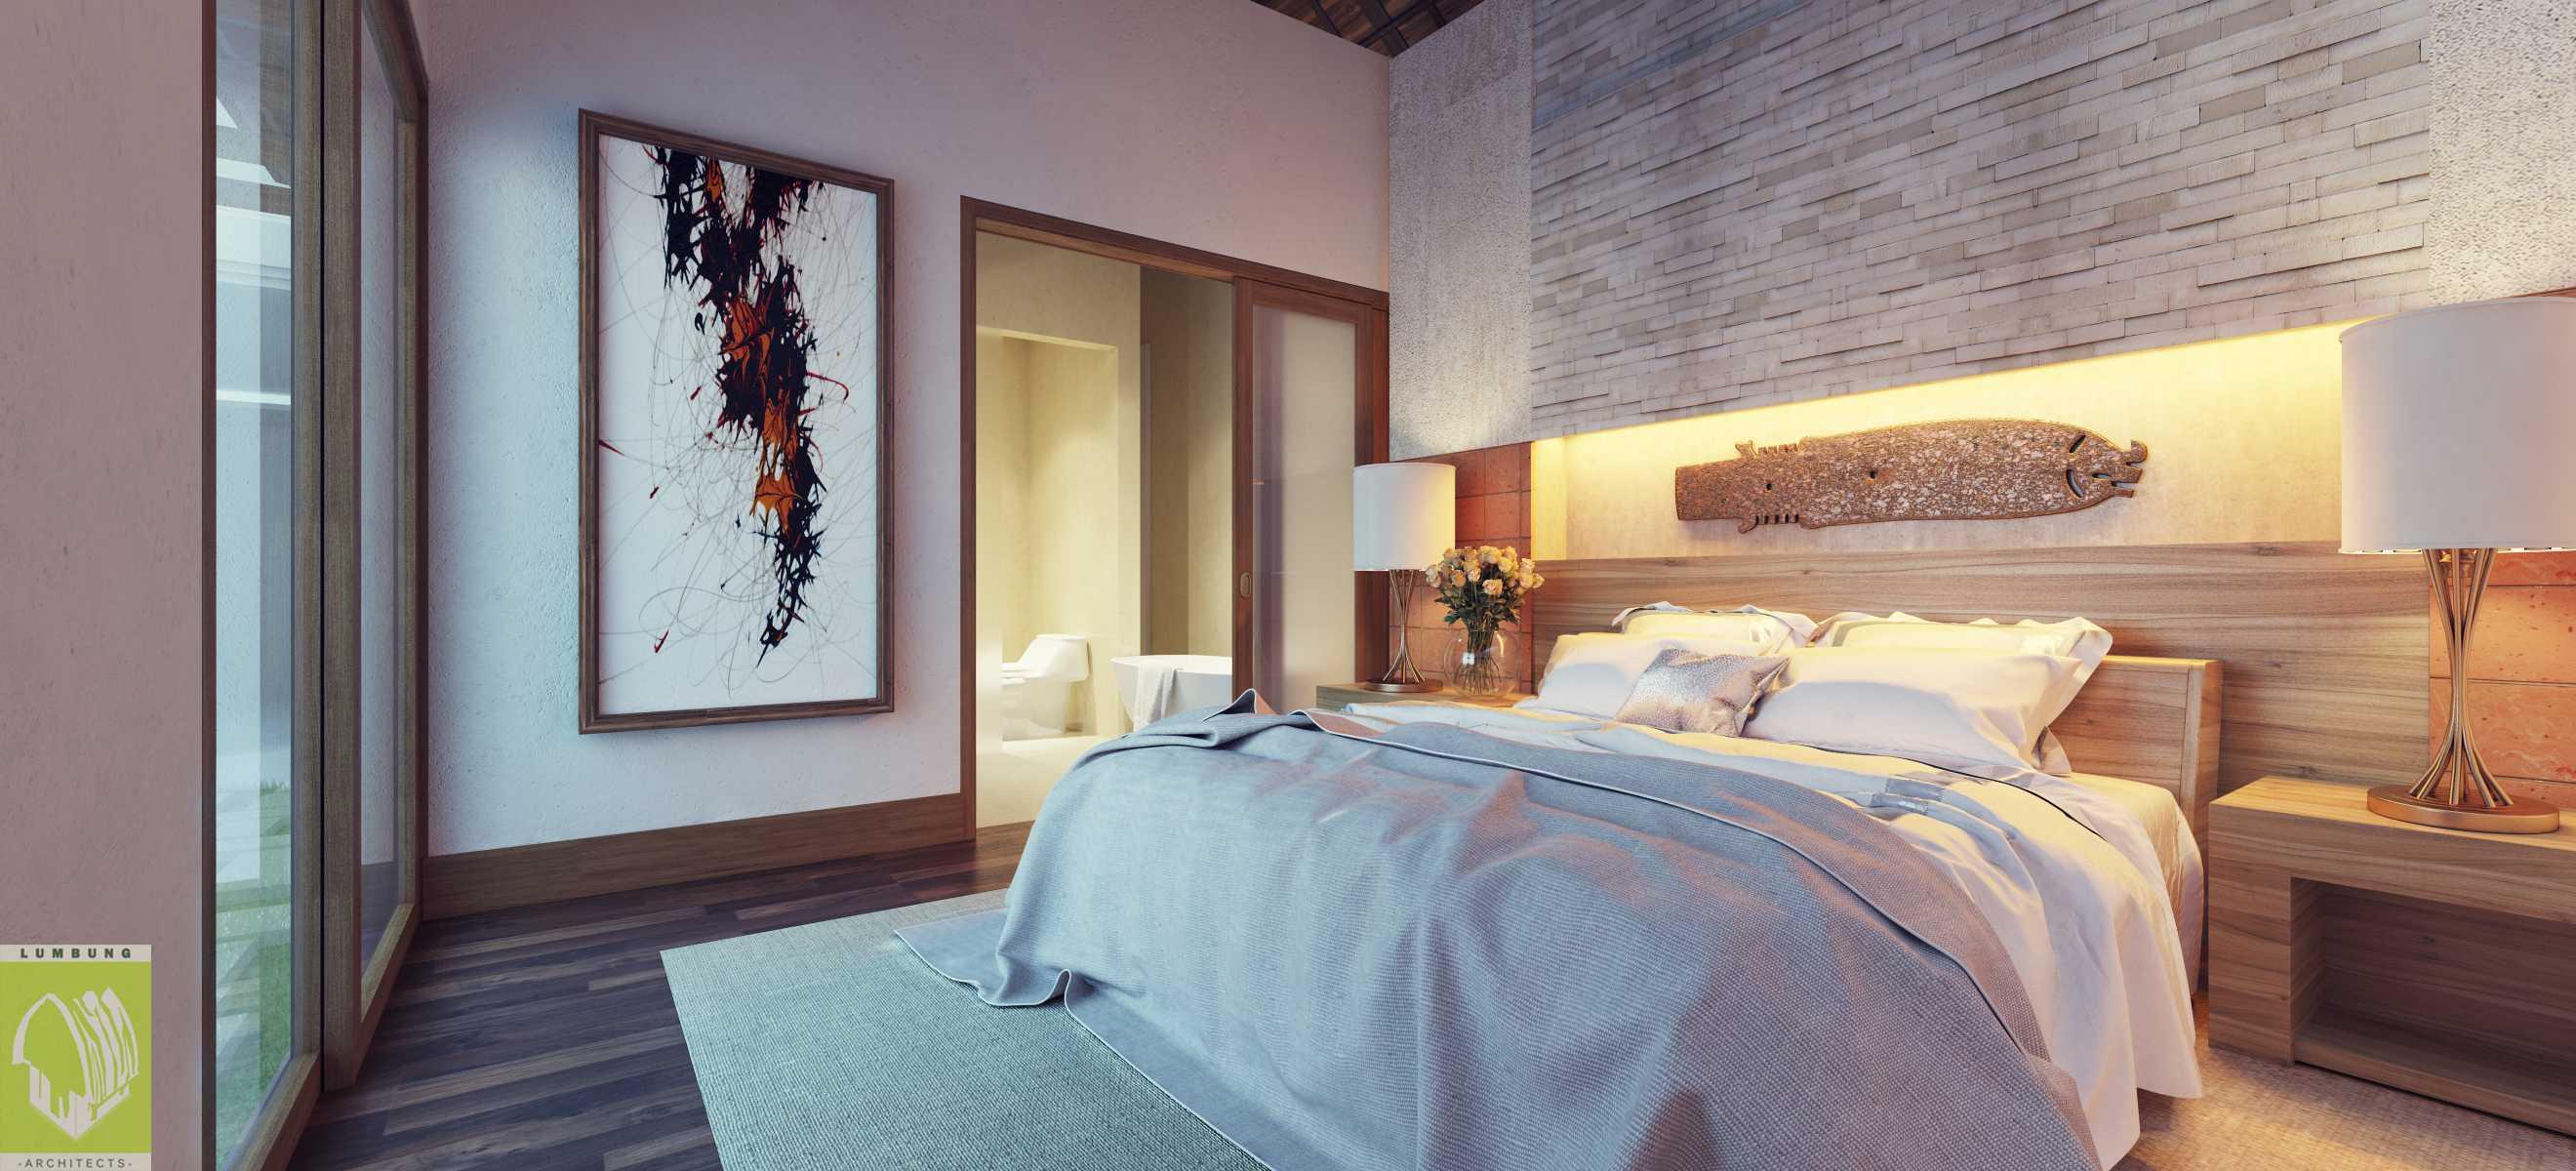 Studio Lumbung Architects Mokko Suite Umalas, Badung - Bali Umalas, Badung - Bali Hotel Room   11718